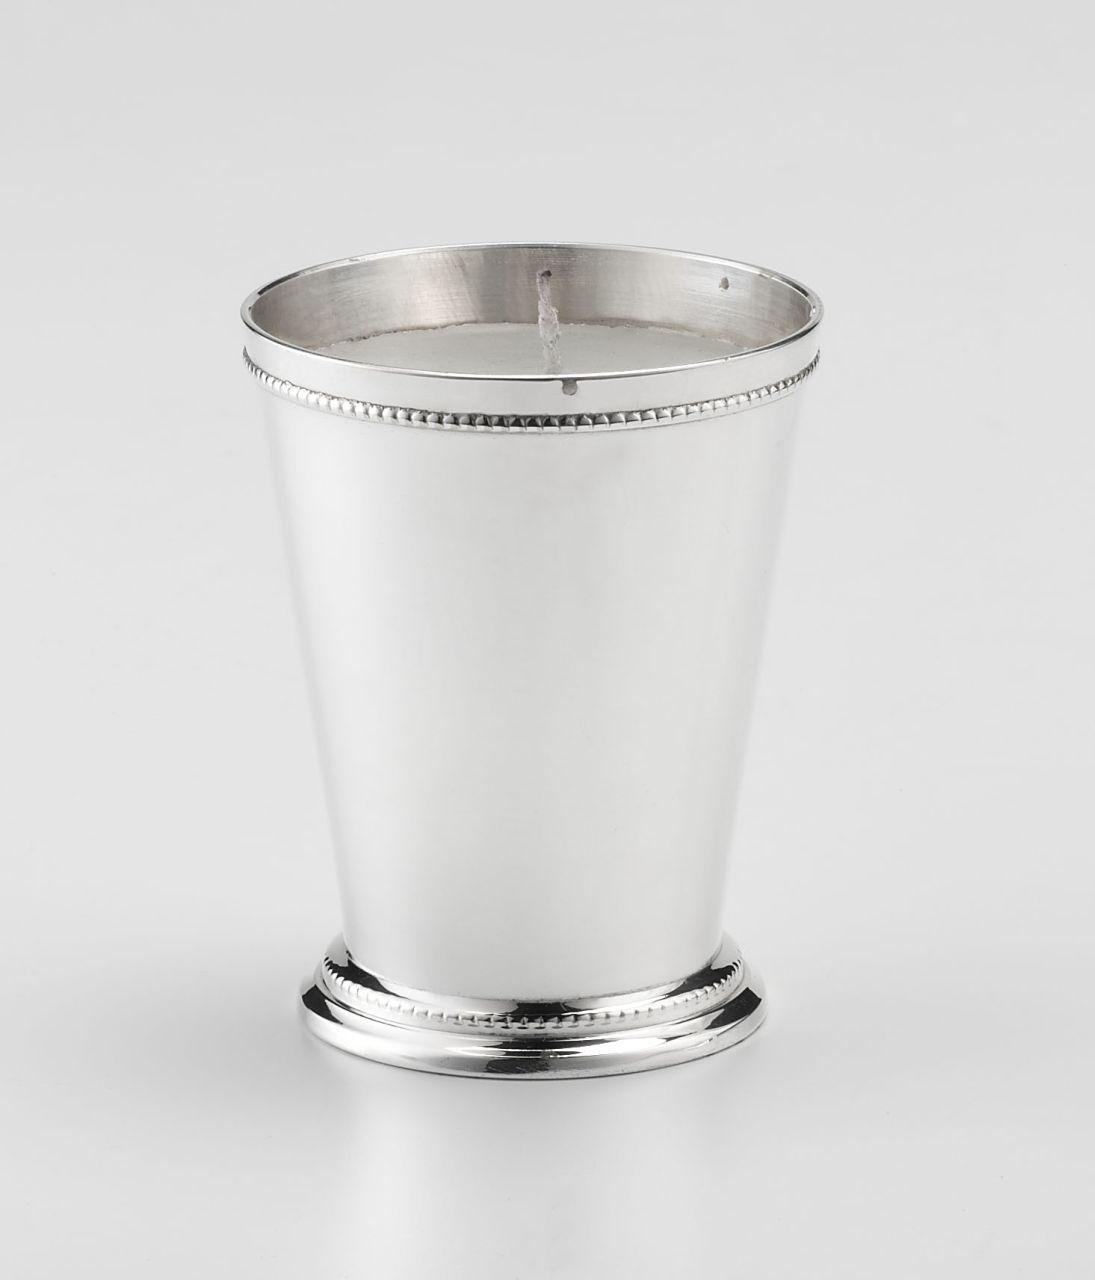 Portacandela argentato argento sheffield stile perlinato